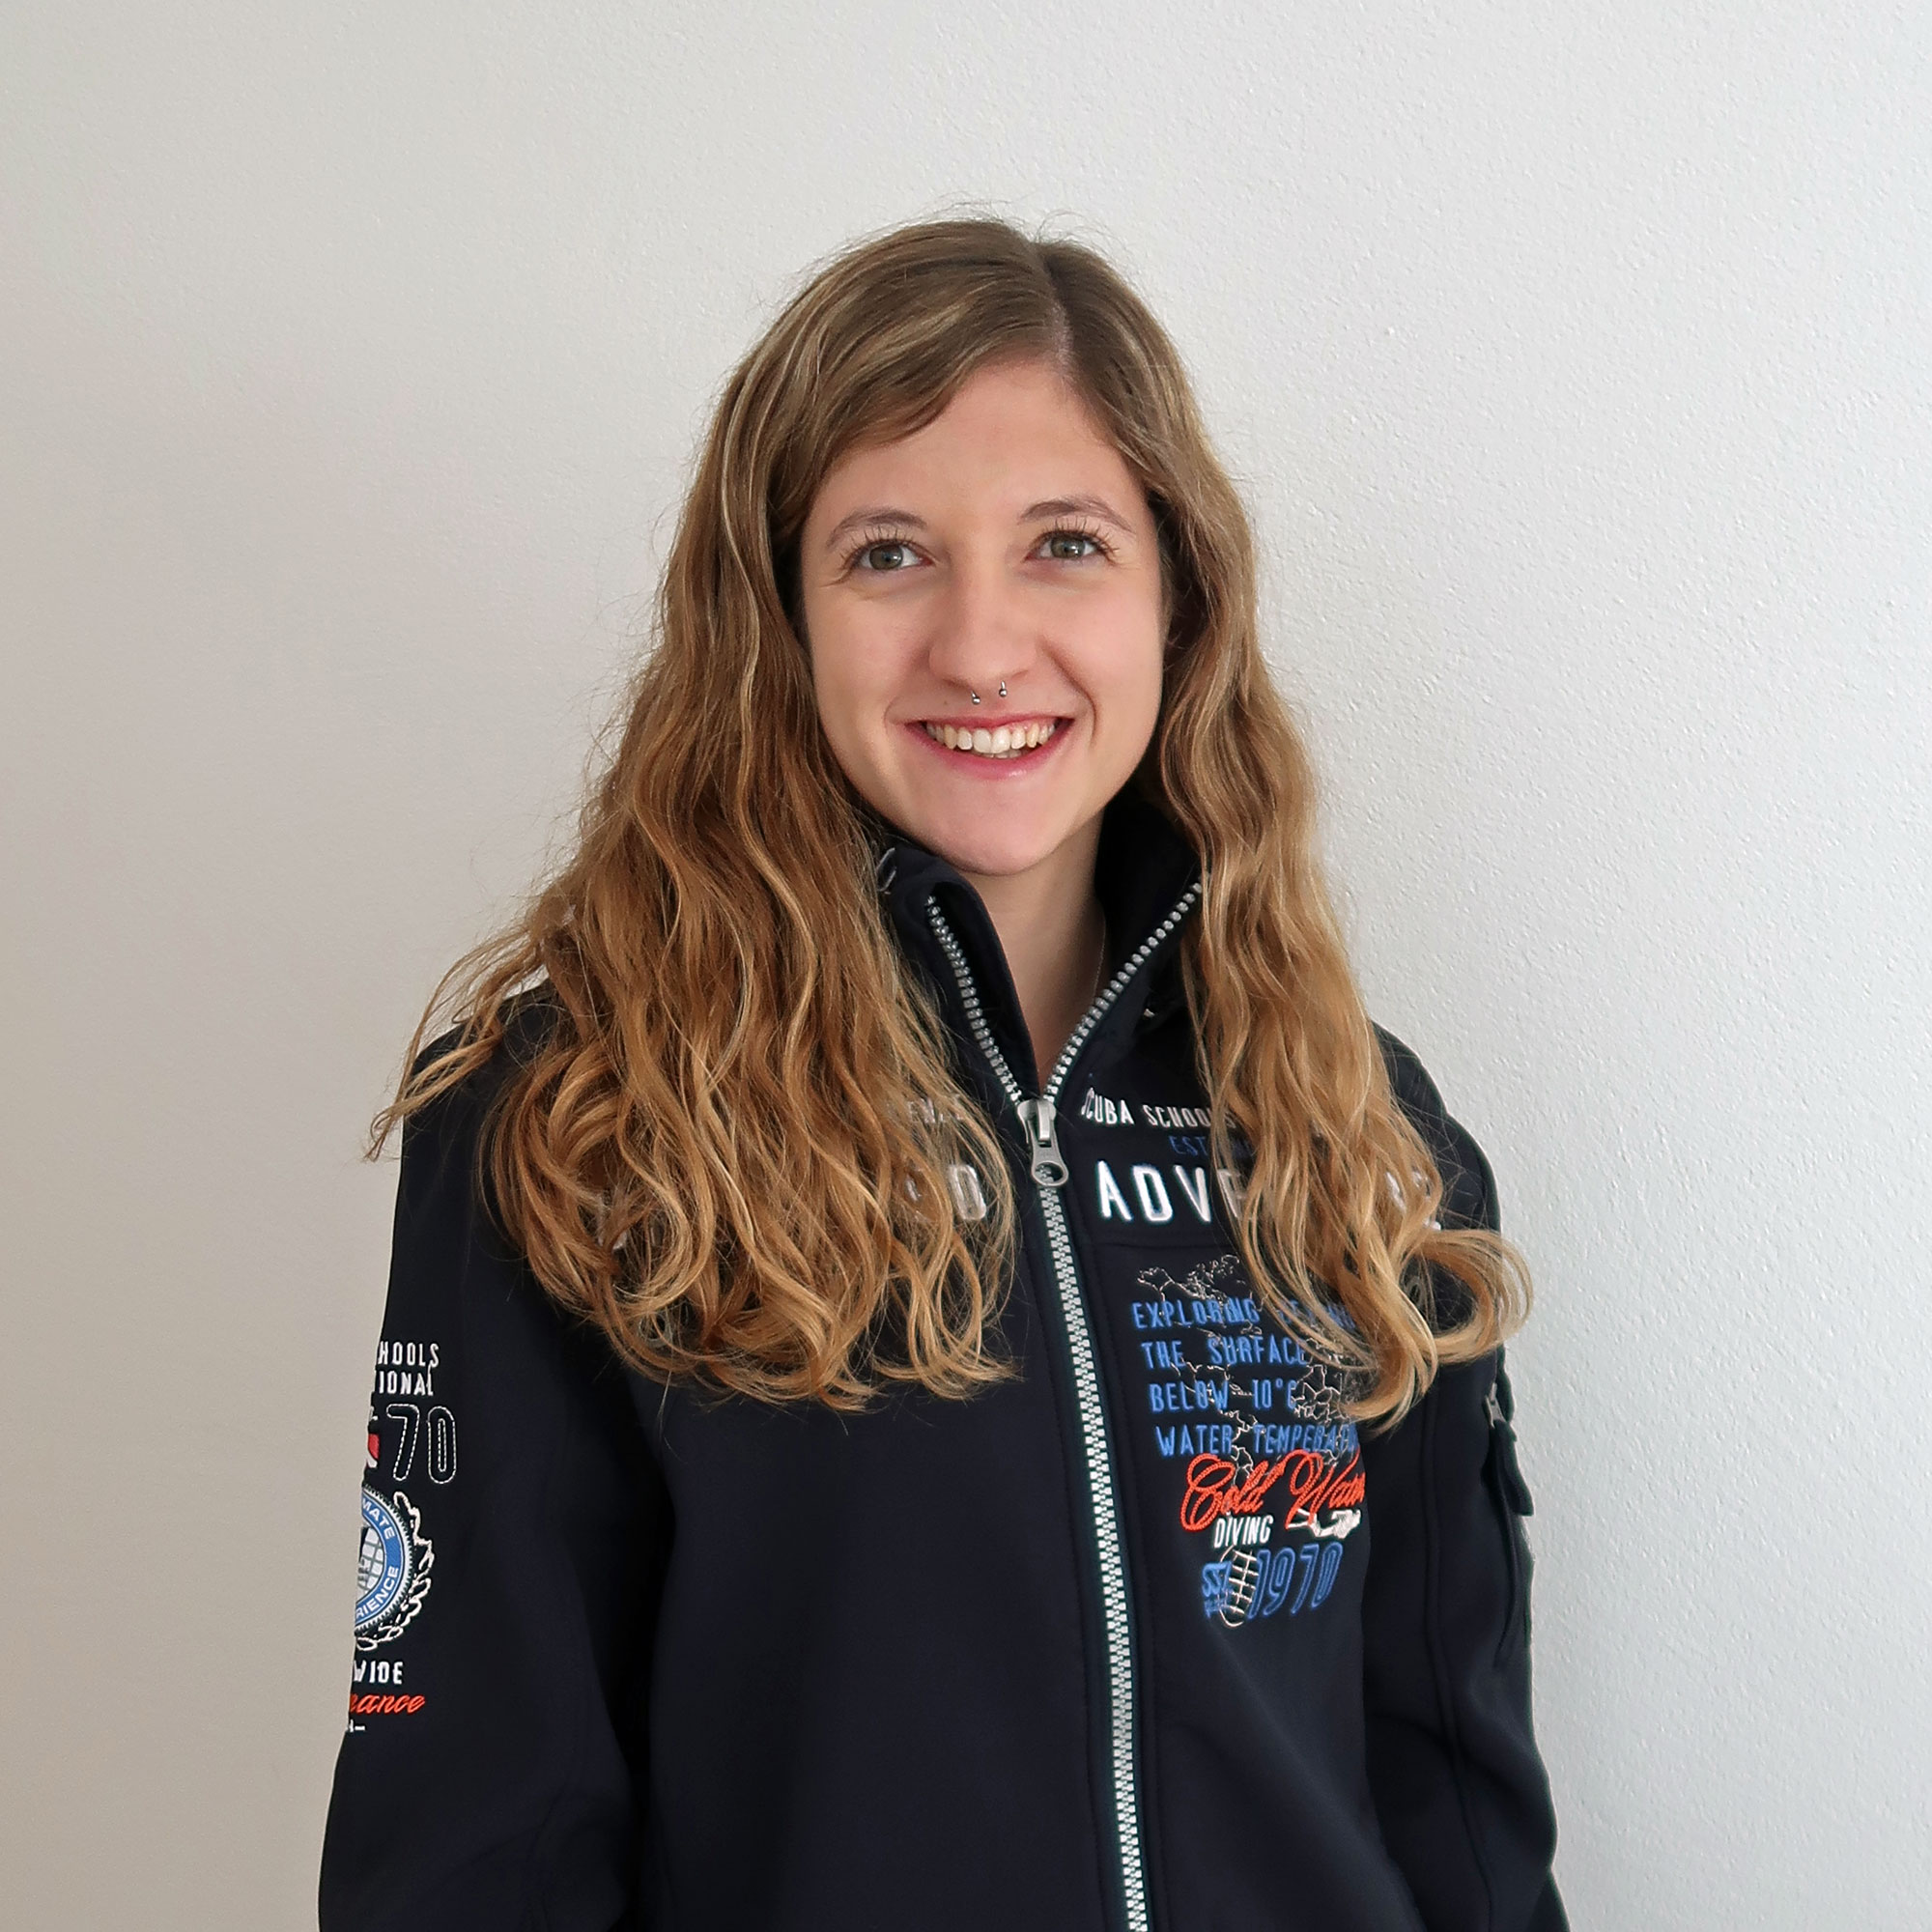 Nicole Widmer